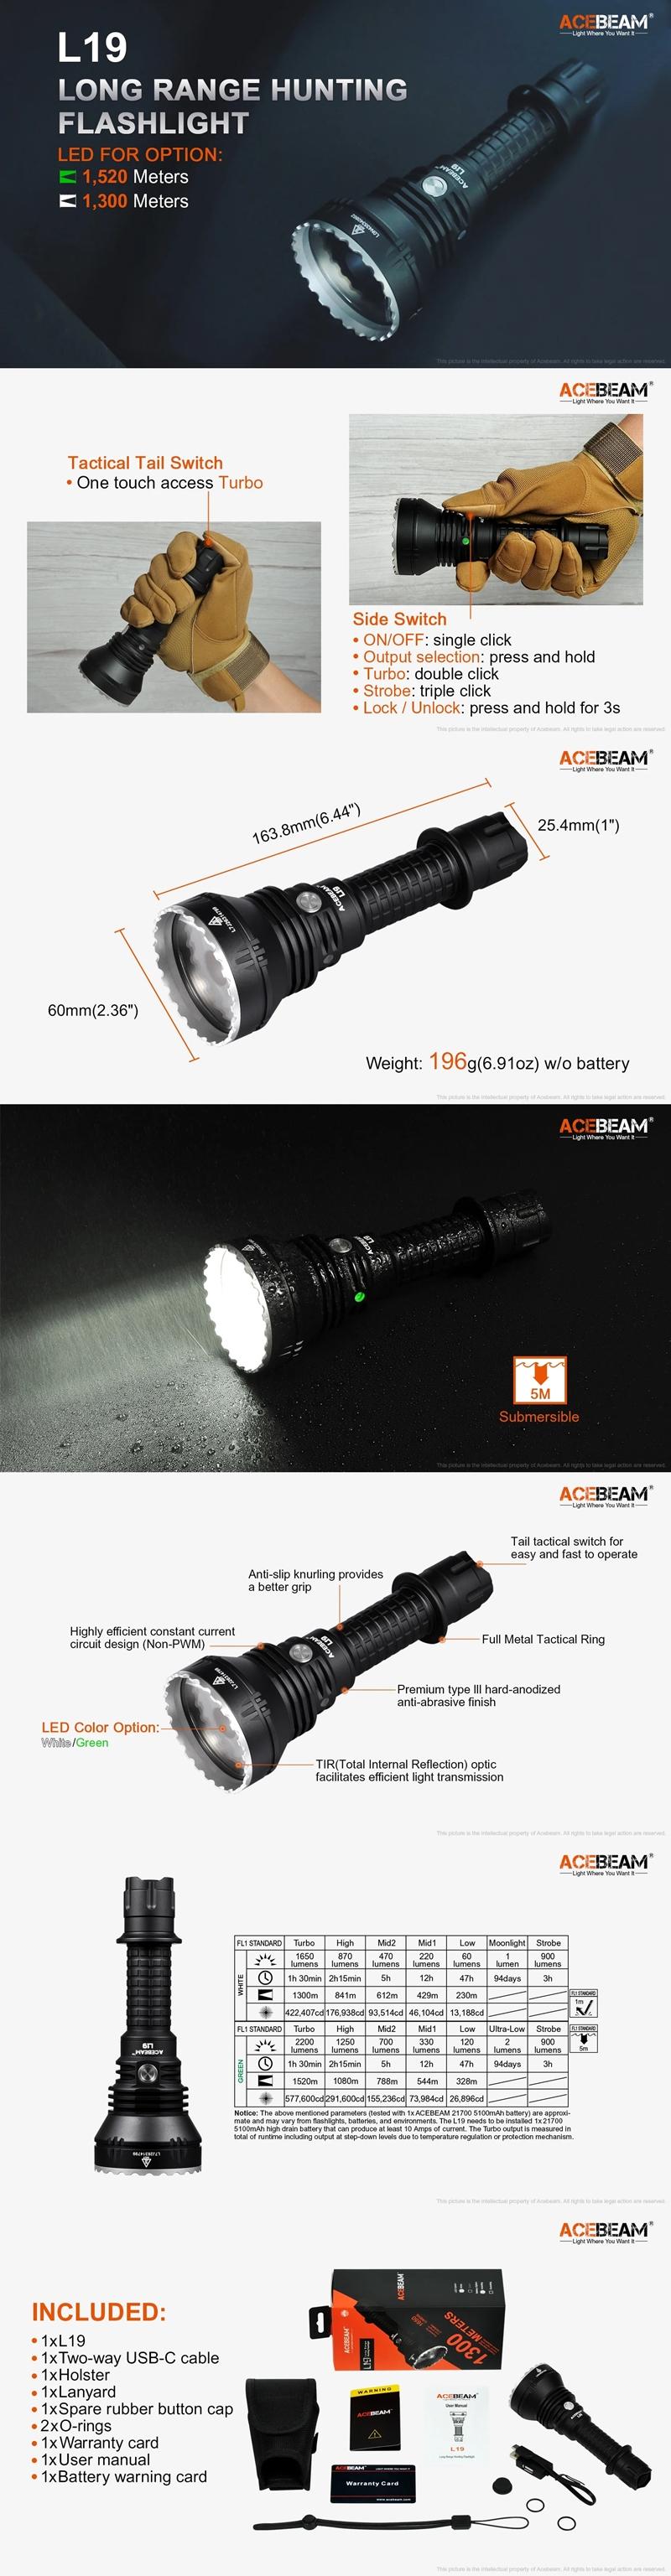 1.ACEBEAM L19 遠射程 戰術手電筒 BEST LONG RANGE FLASHLIGHT 錸特光電 台灣總代理-6